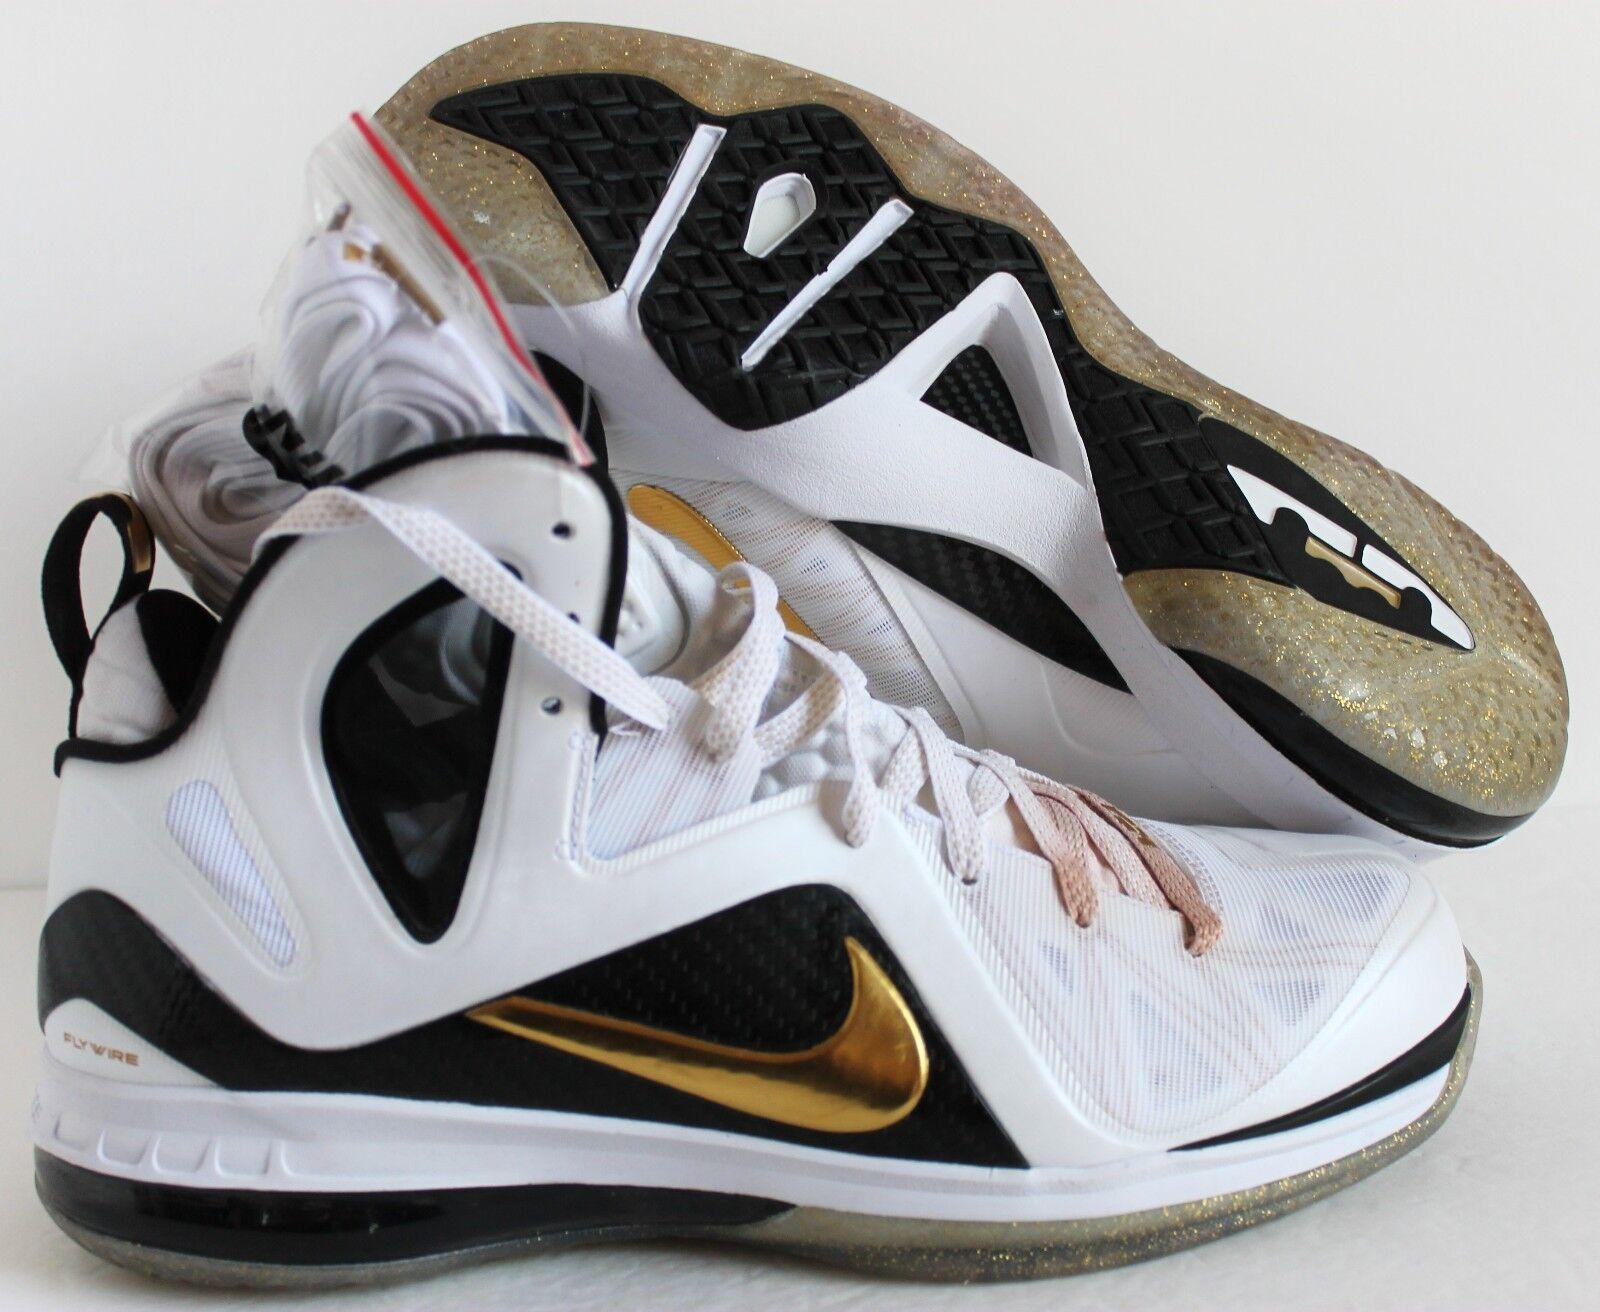 Nike lebron lebron lebron james zu hause 9 s. elite Weiß-gold-schwarz sz 11 [516958-100] 526bae